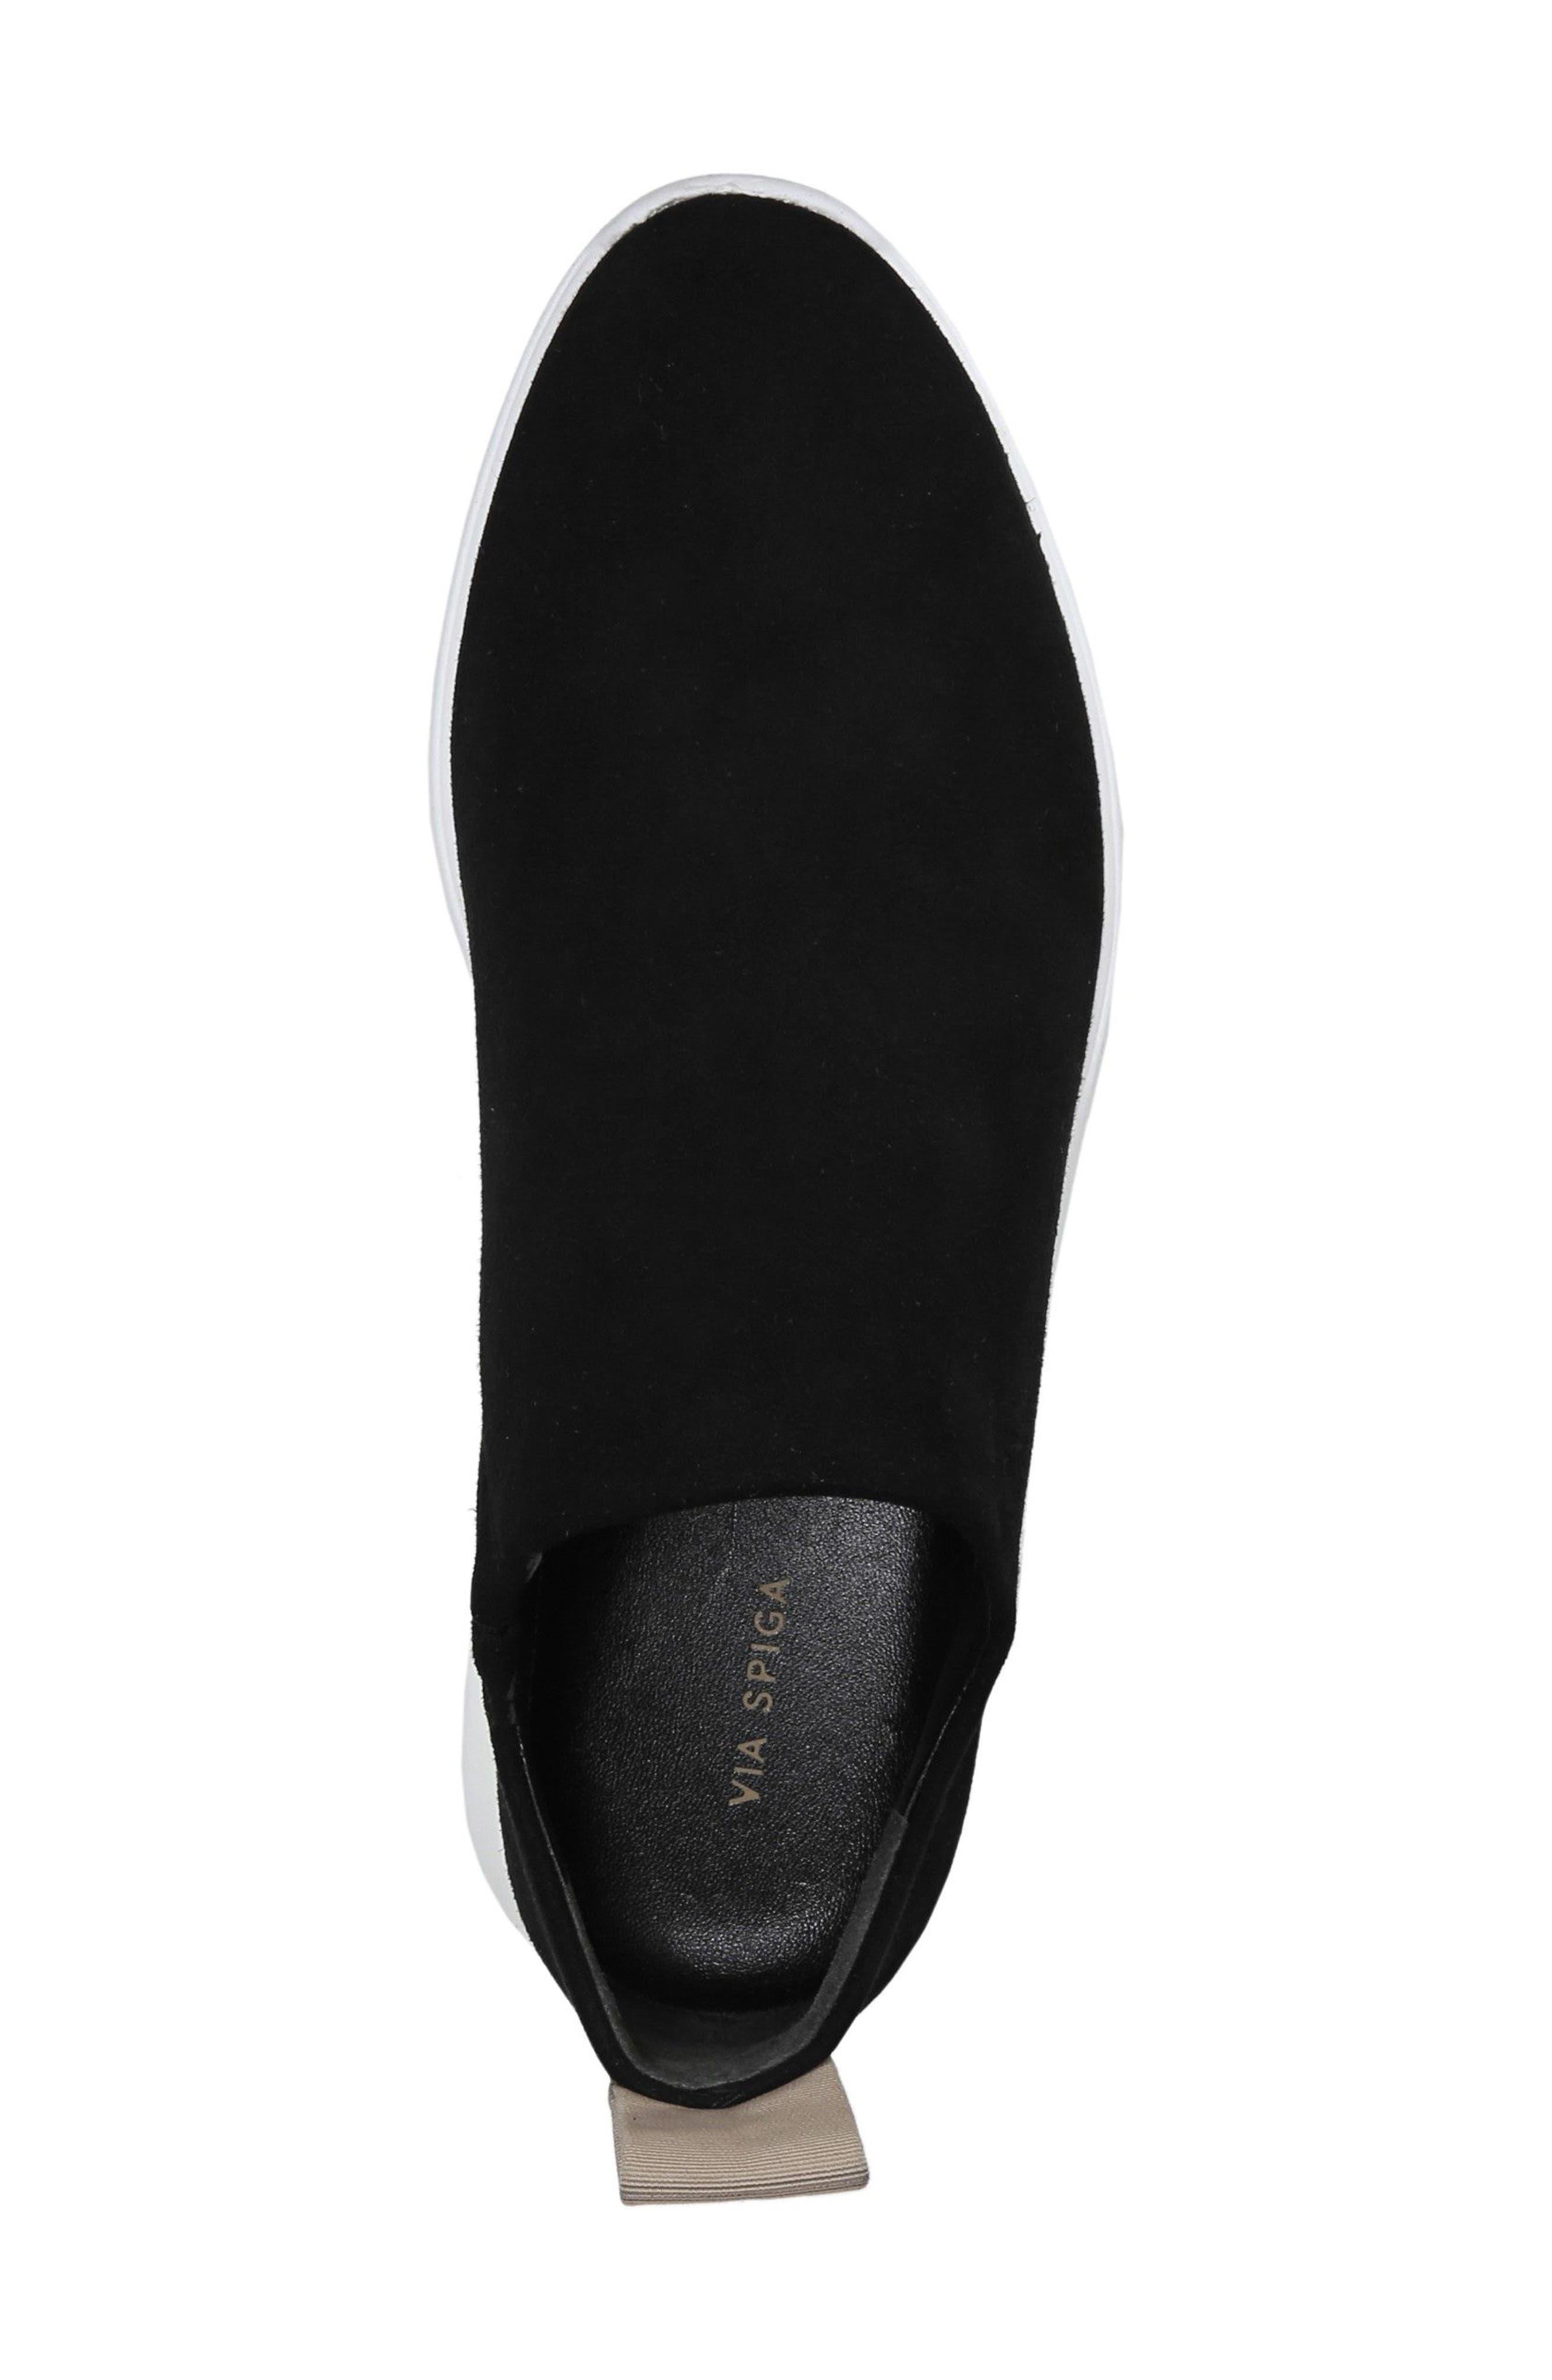 VIA SPIGA, Marlow Slip-On Sneaker, Alternate thumbnail 5, color, BLACK SUEDE